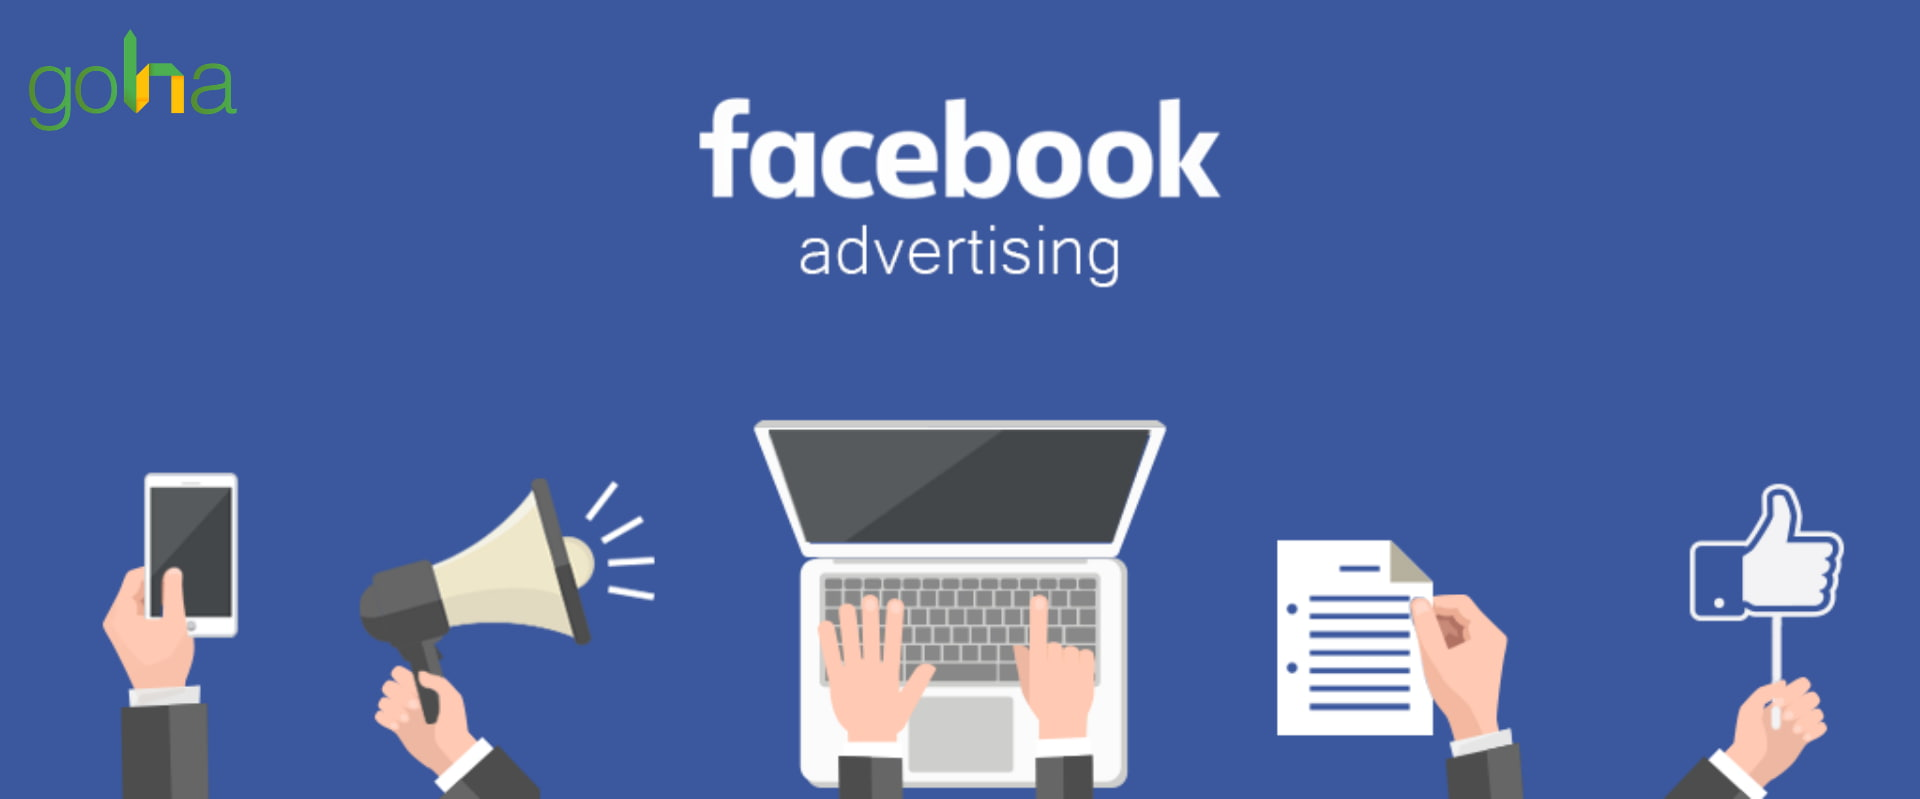 facebook-dang-la-nen-tang-mang-xa-hoi-lon-nhat-hien-nay